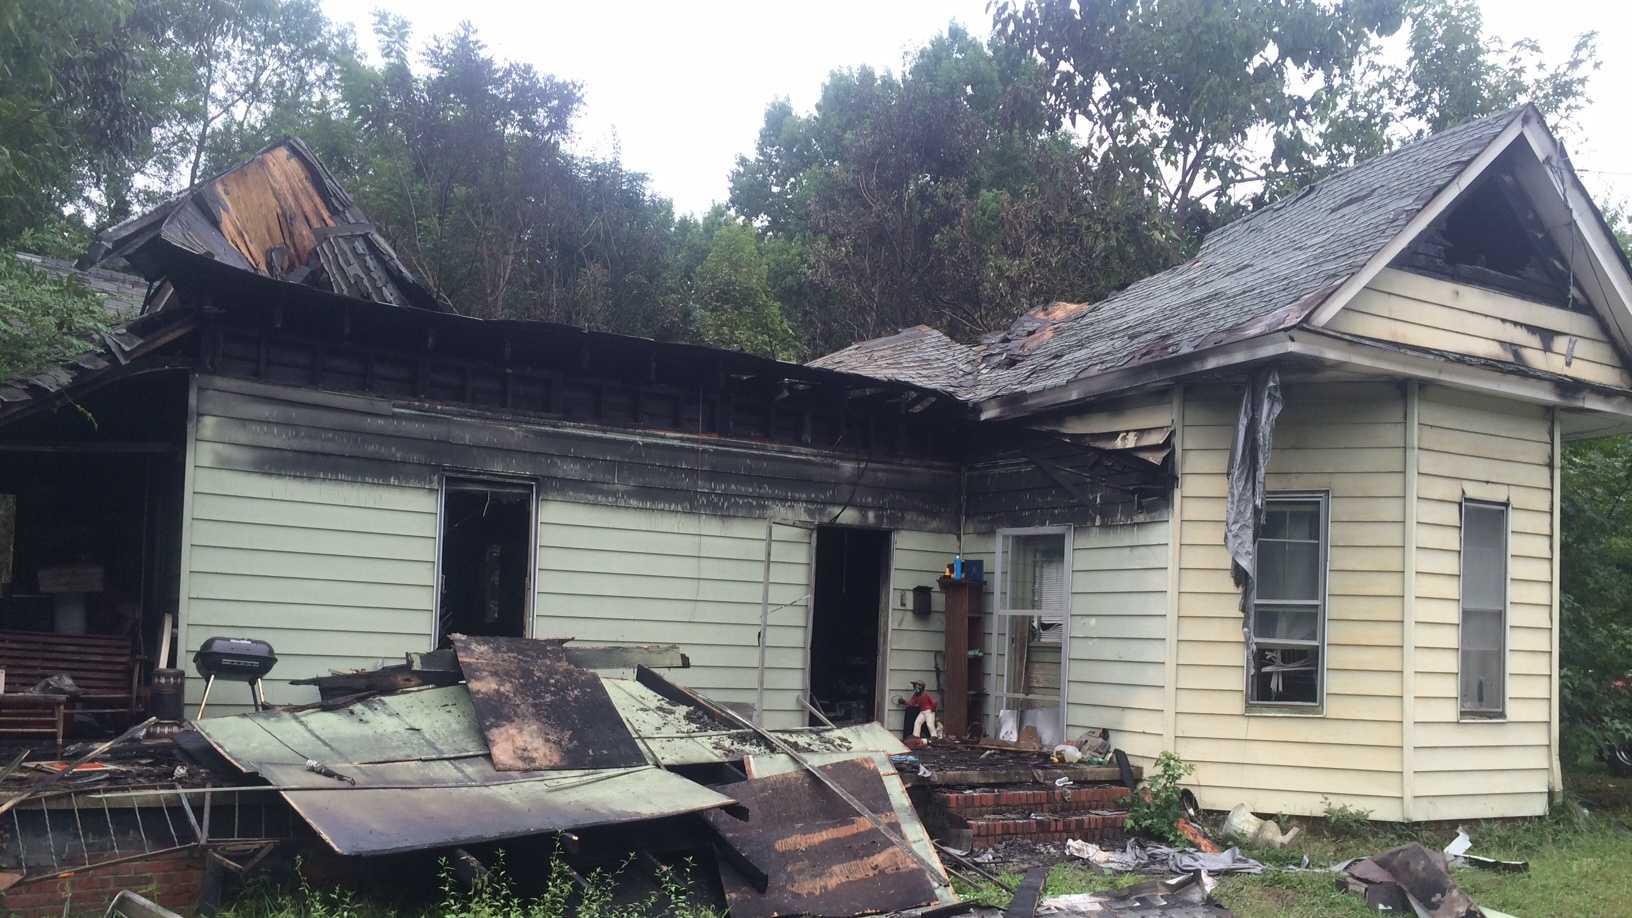 Easley arson investigation